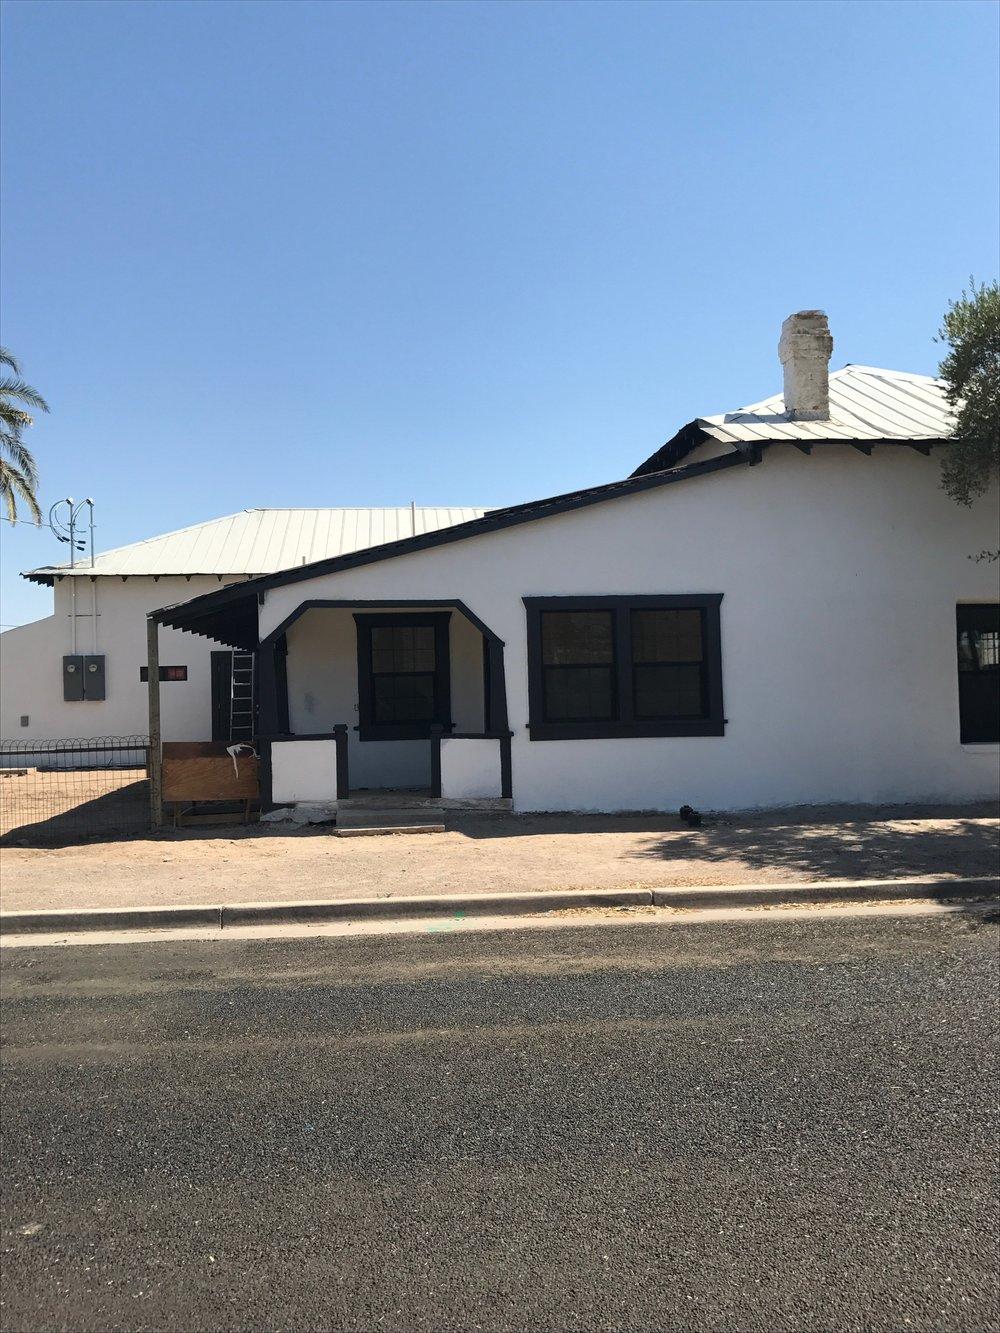 Rowhouse25 - Tremaine Ranch - Air BNB Rental - Phoenix, Arizona23.JPG